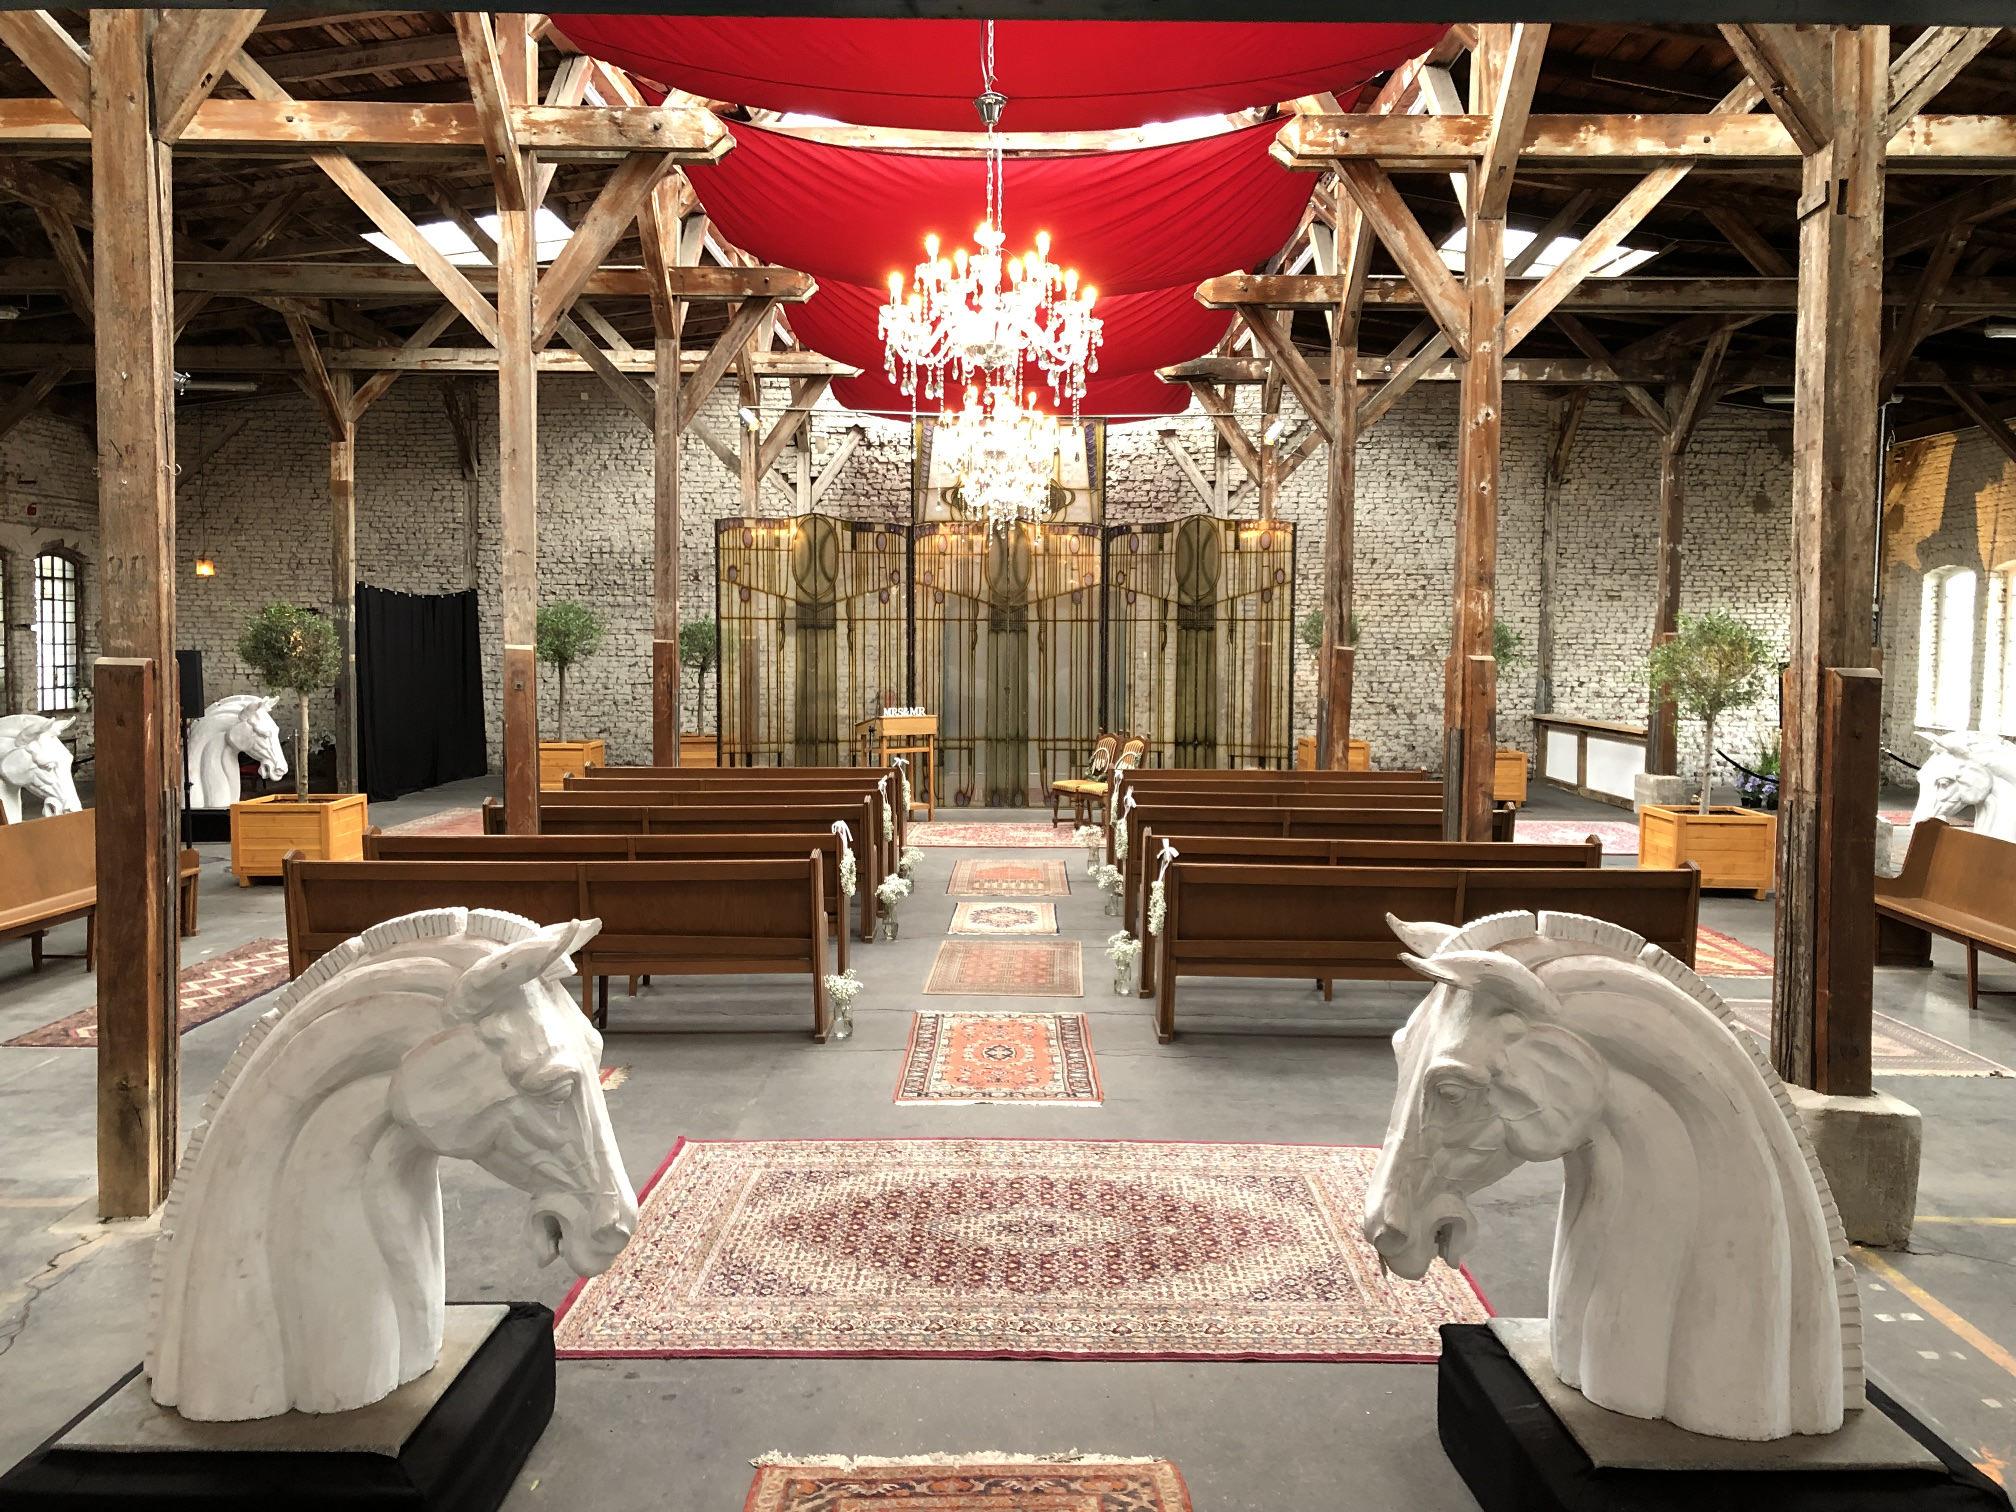 Blick in Trausaal von Chapelle de Nüss